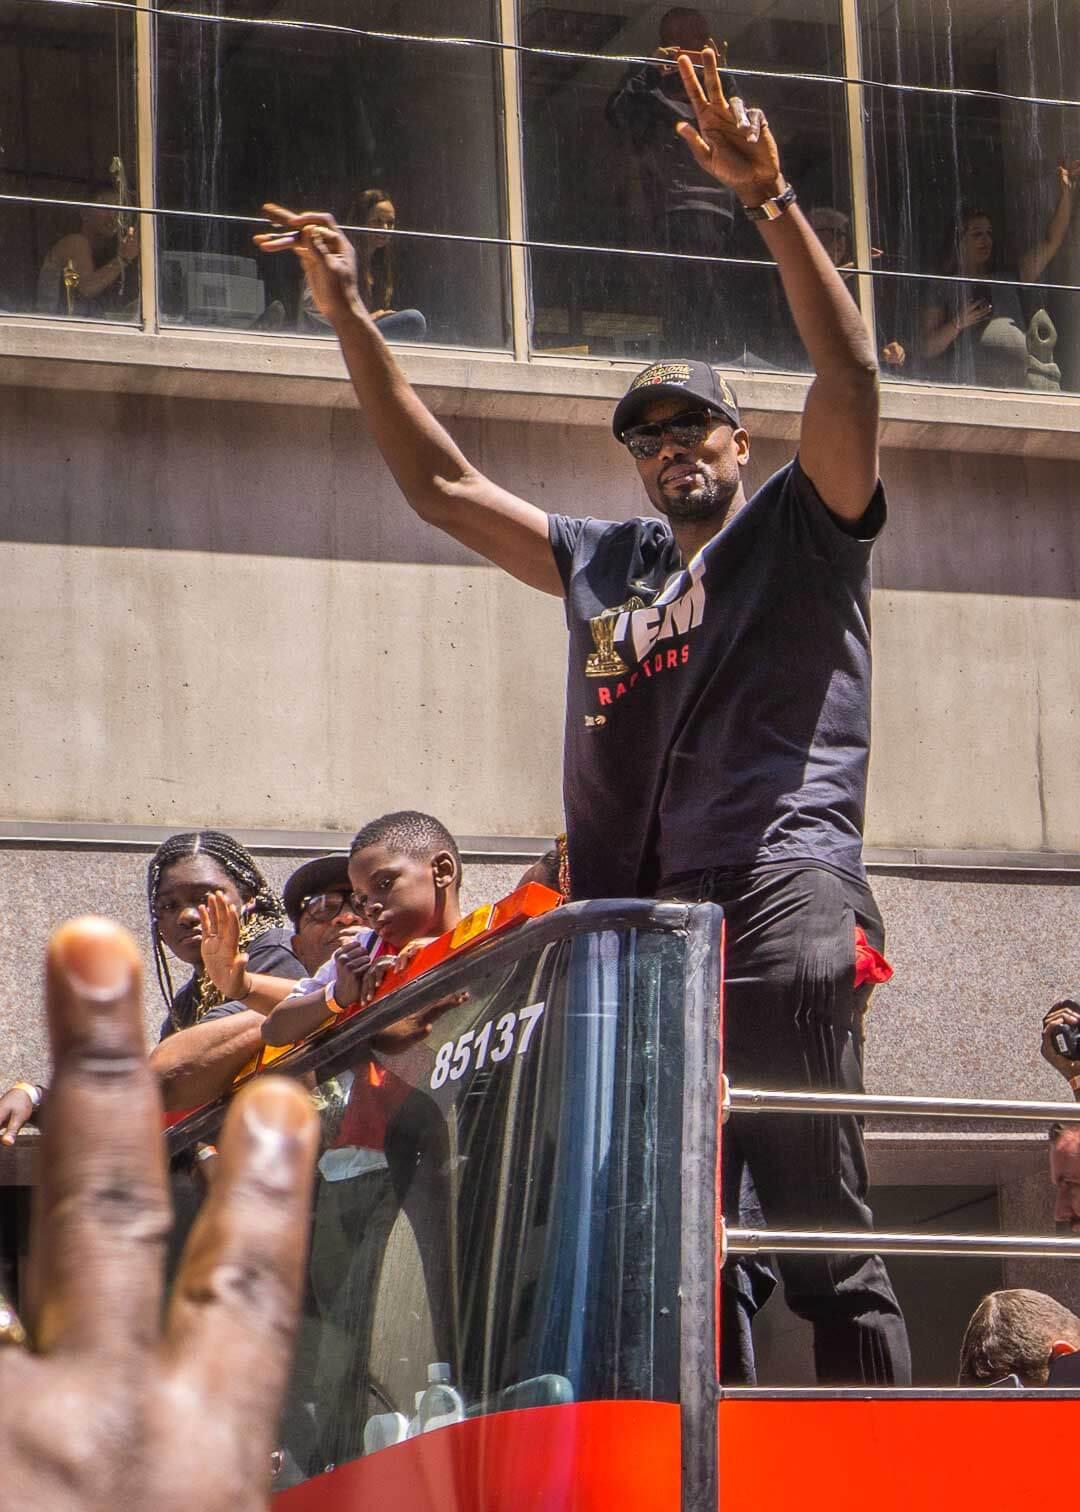 Raptors championship celebration parade - Serge Ibaka